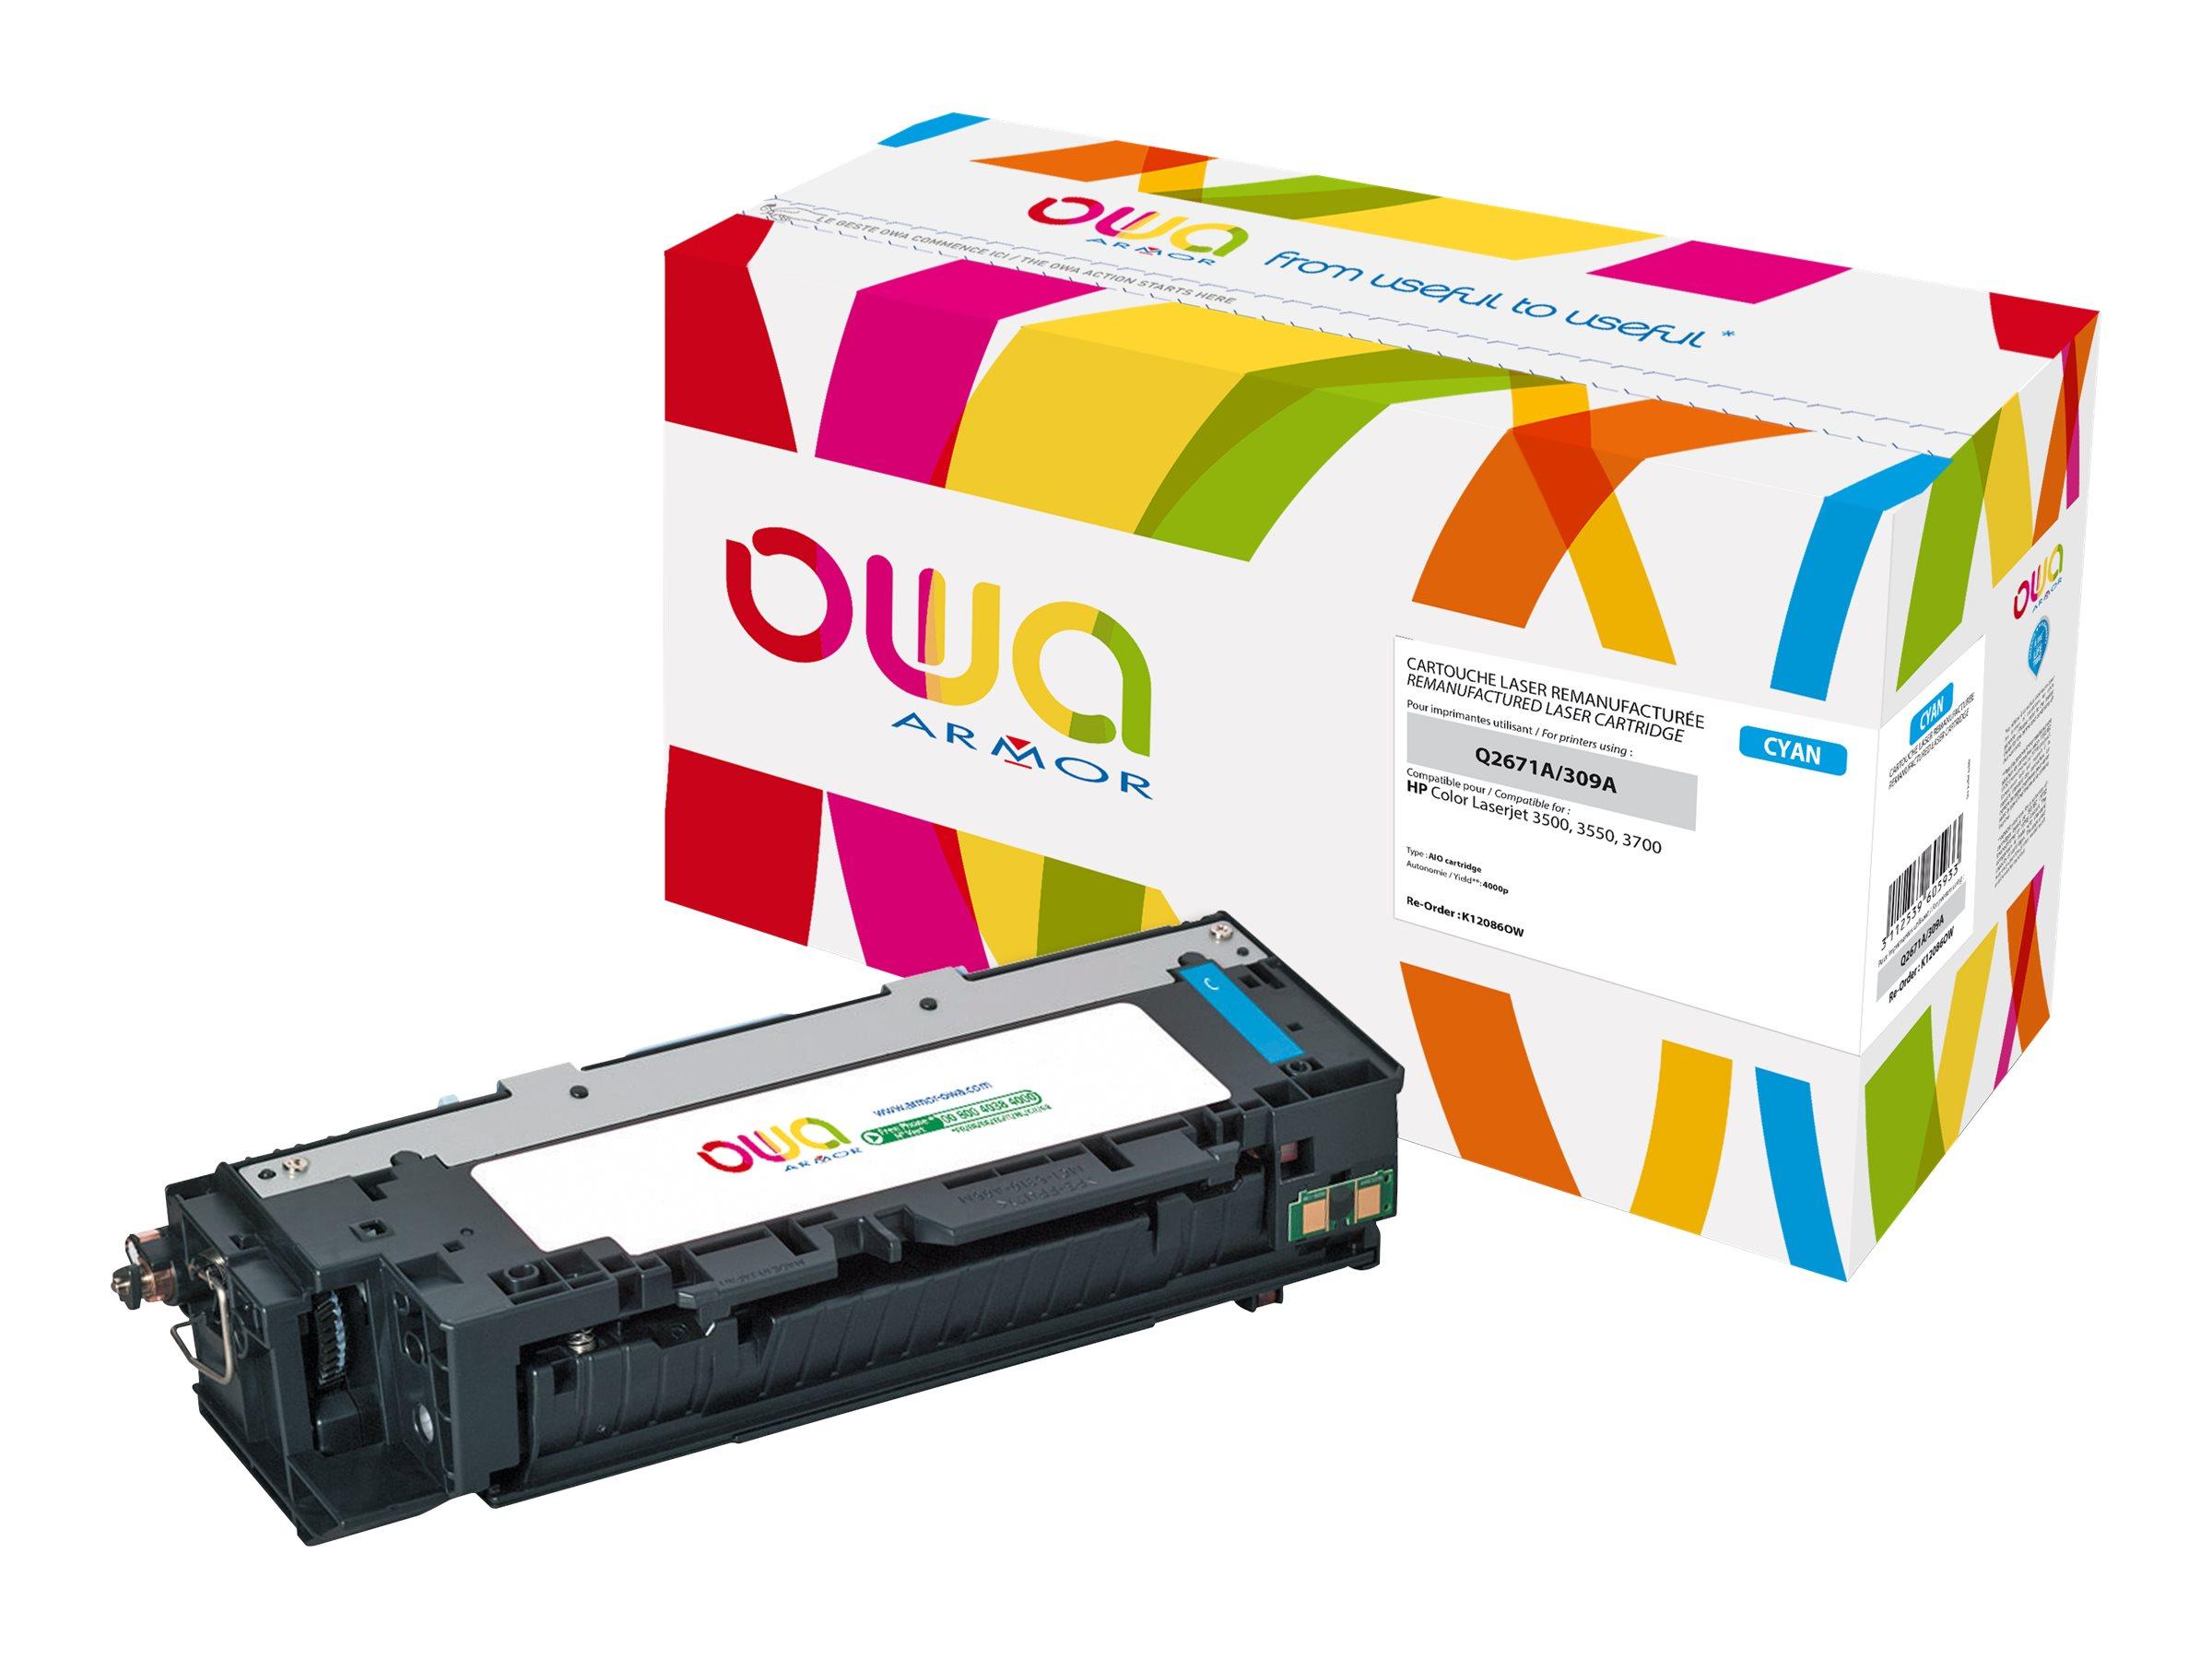 HP 309A - remanufacturé OWA K12086OW - cyan - cartouche laser